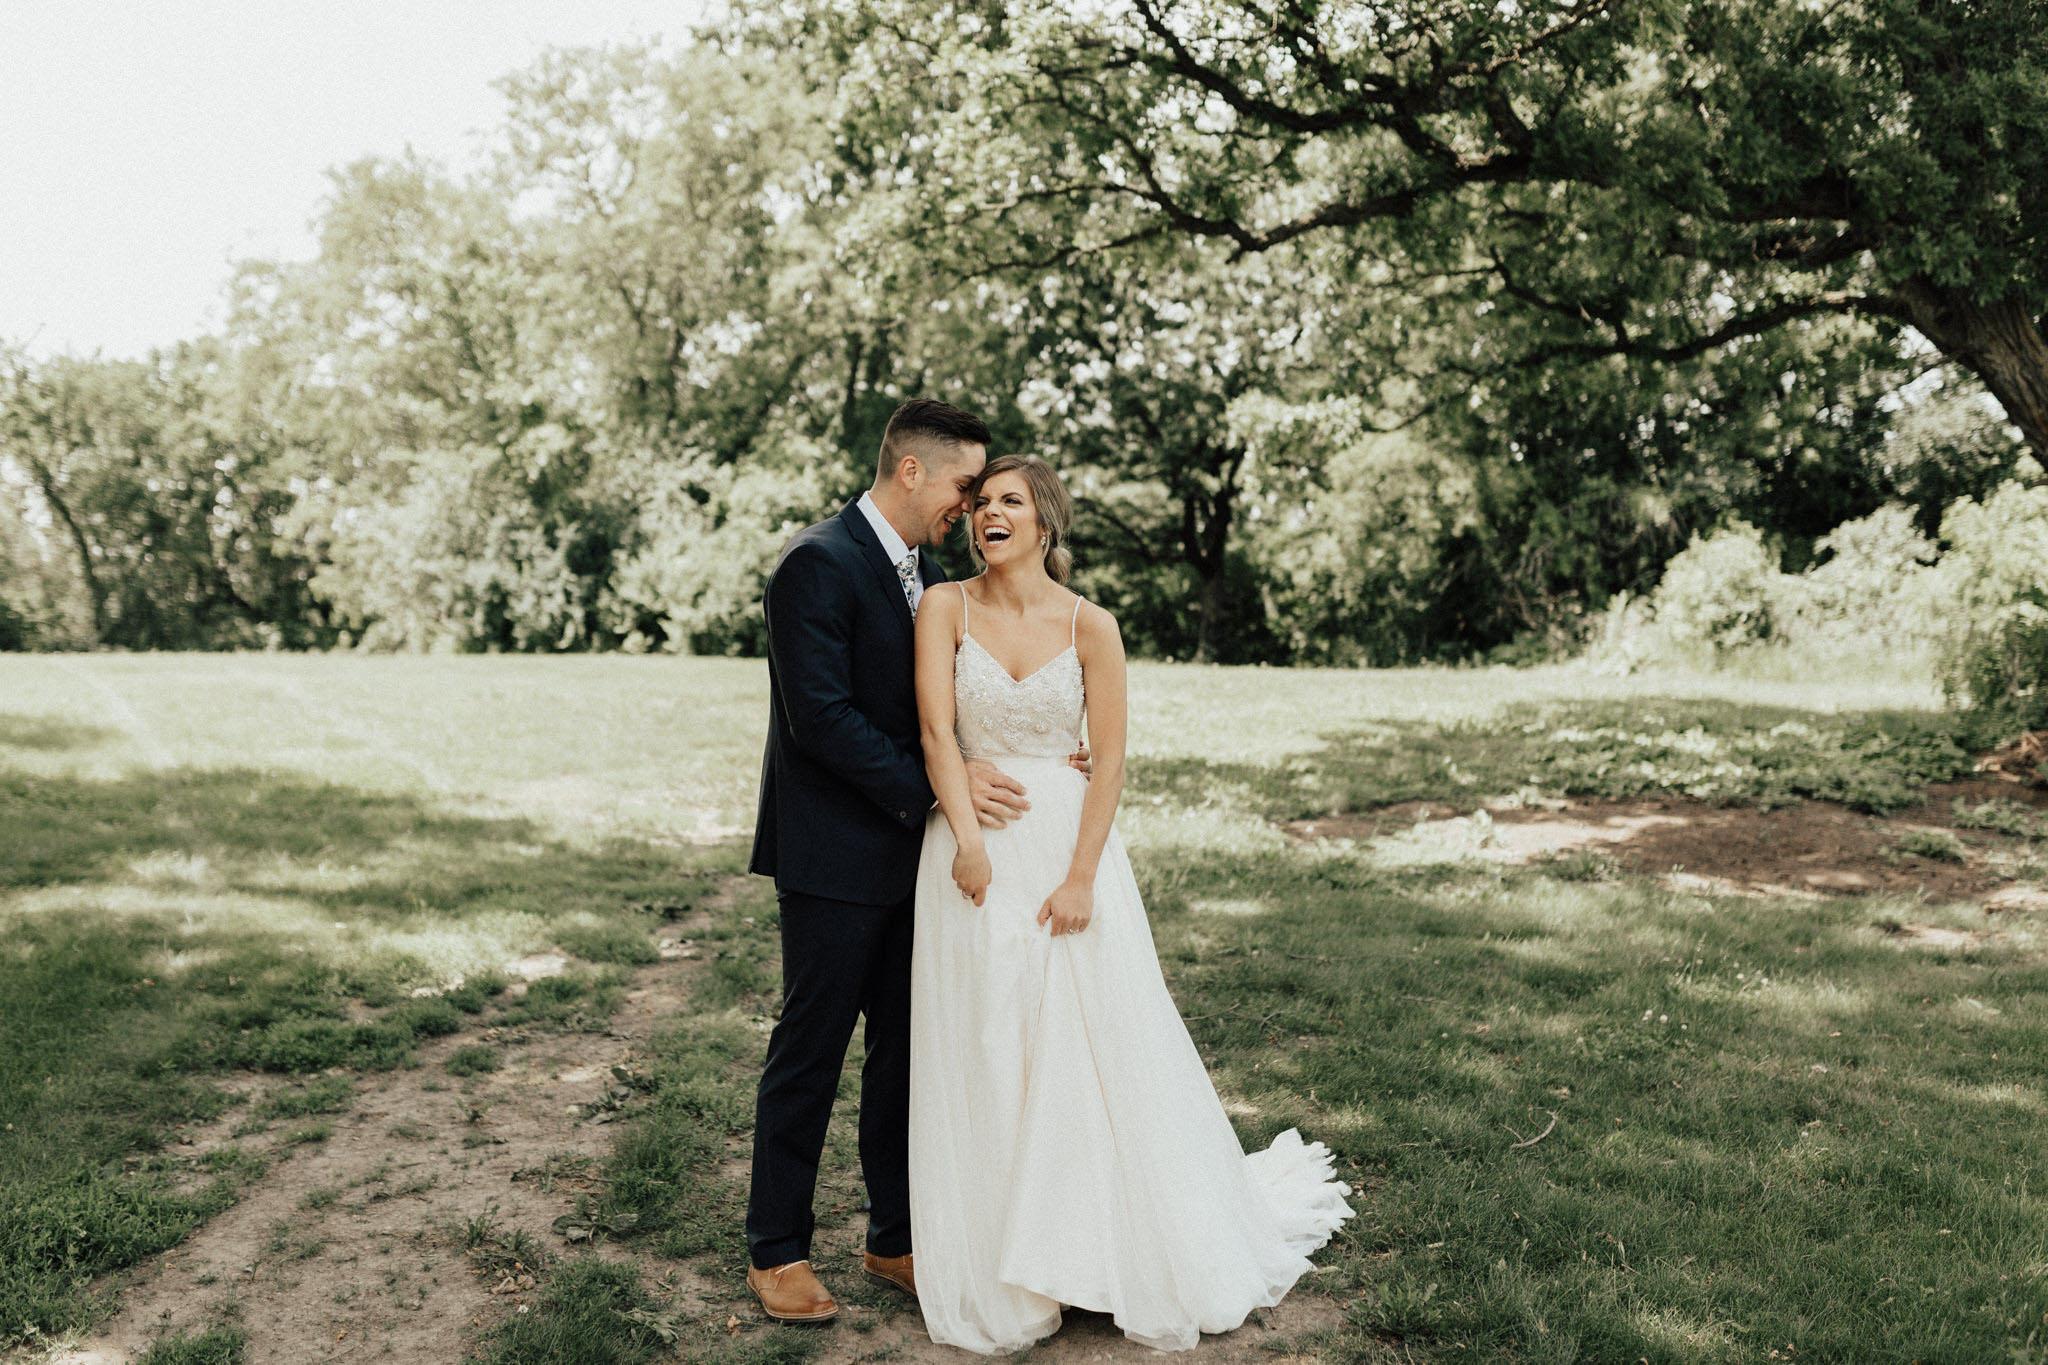 Arizona-Adventure-Elopement-Wedding-Photographer-148.jpg